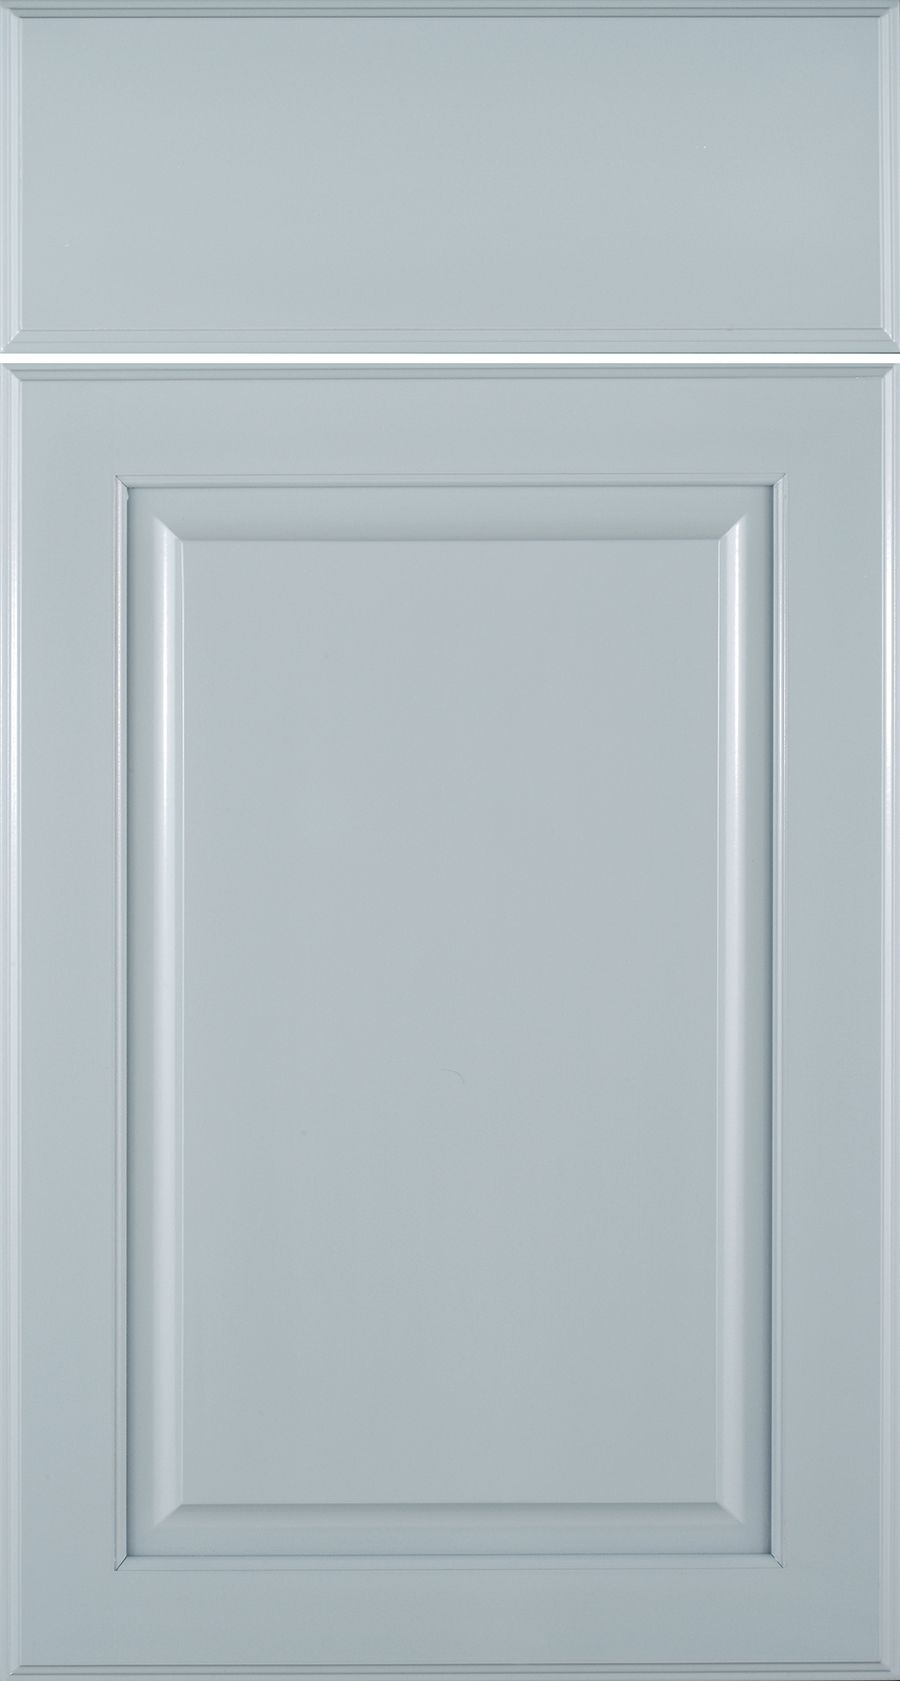 Tomlinson, Maple/MDF, Aquasphere, Slab Drawer Front | Cabinets ...